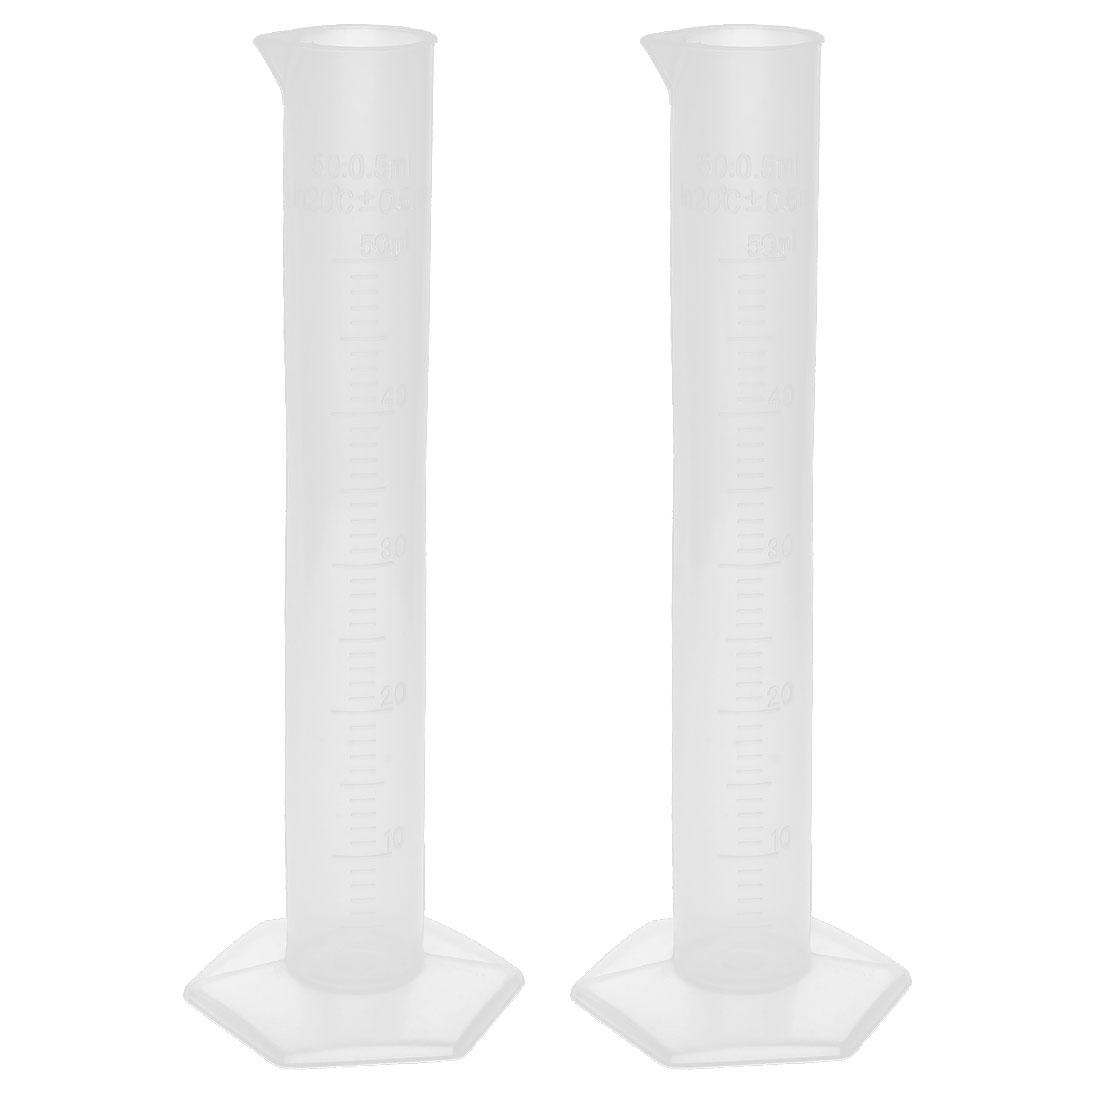 2pcs 50ml Transparent Plastic Graduated Cylinder Laboratory Lab Measuring Cup